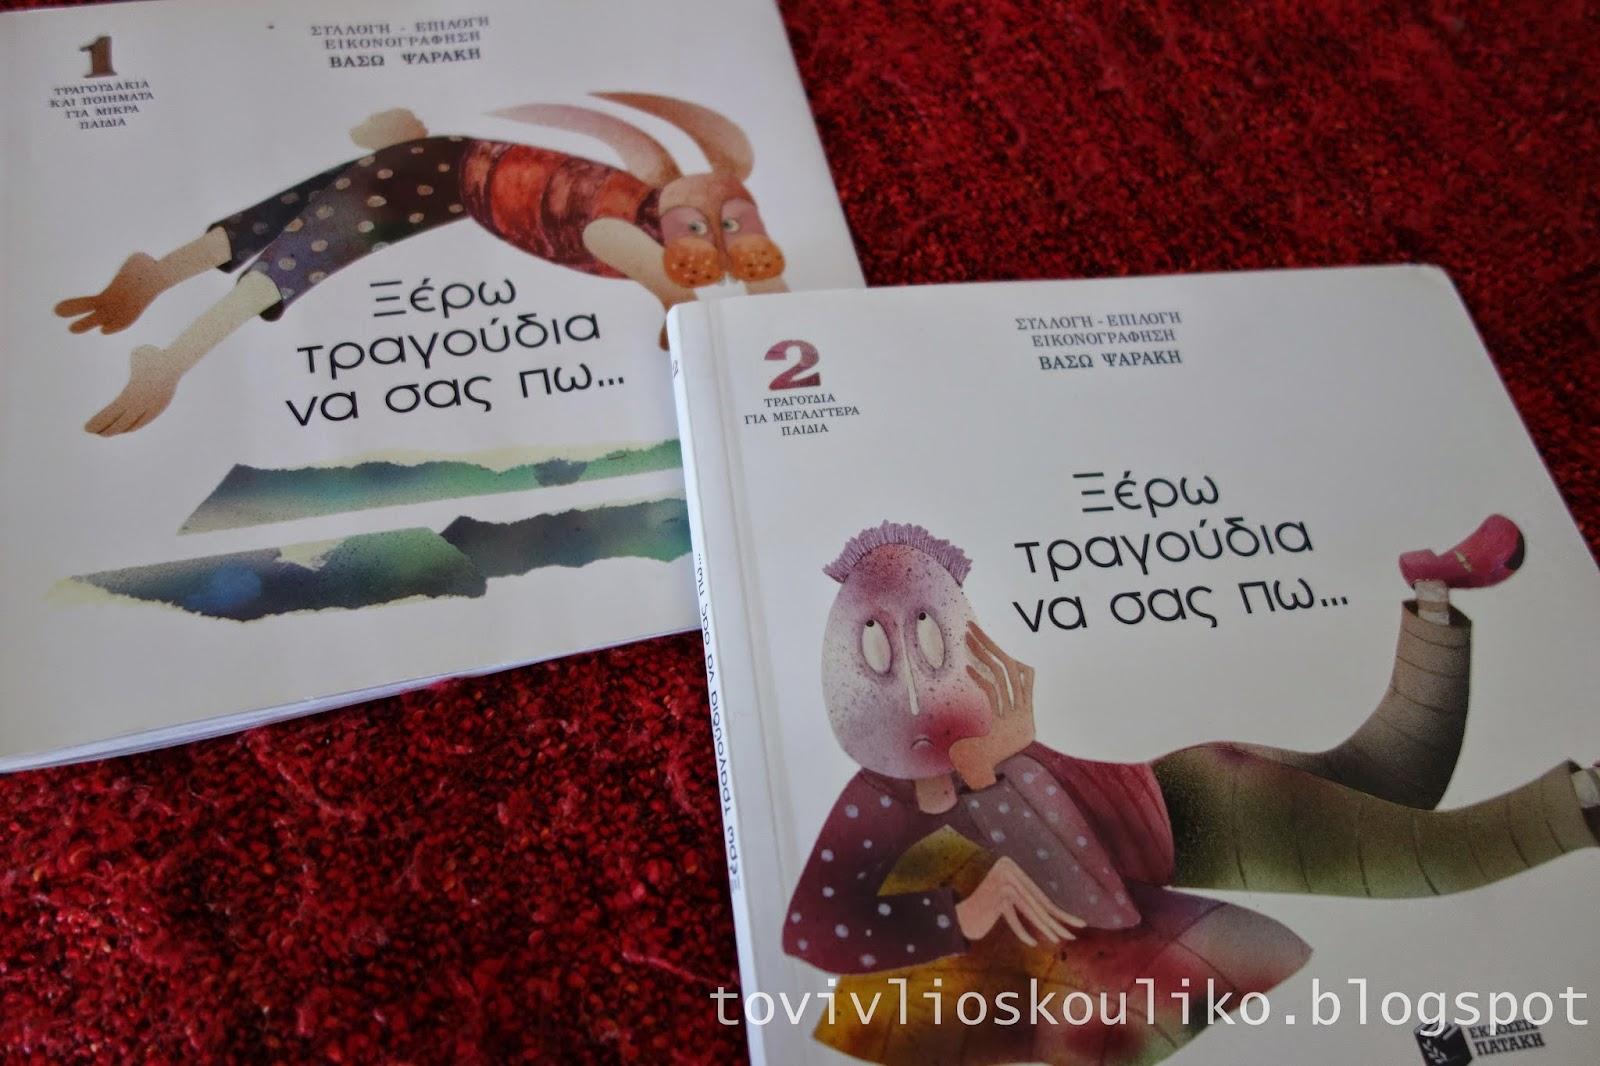 Bookworm  Ξέρω τραγούδια να σας πω... 8deb31b0fa3